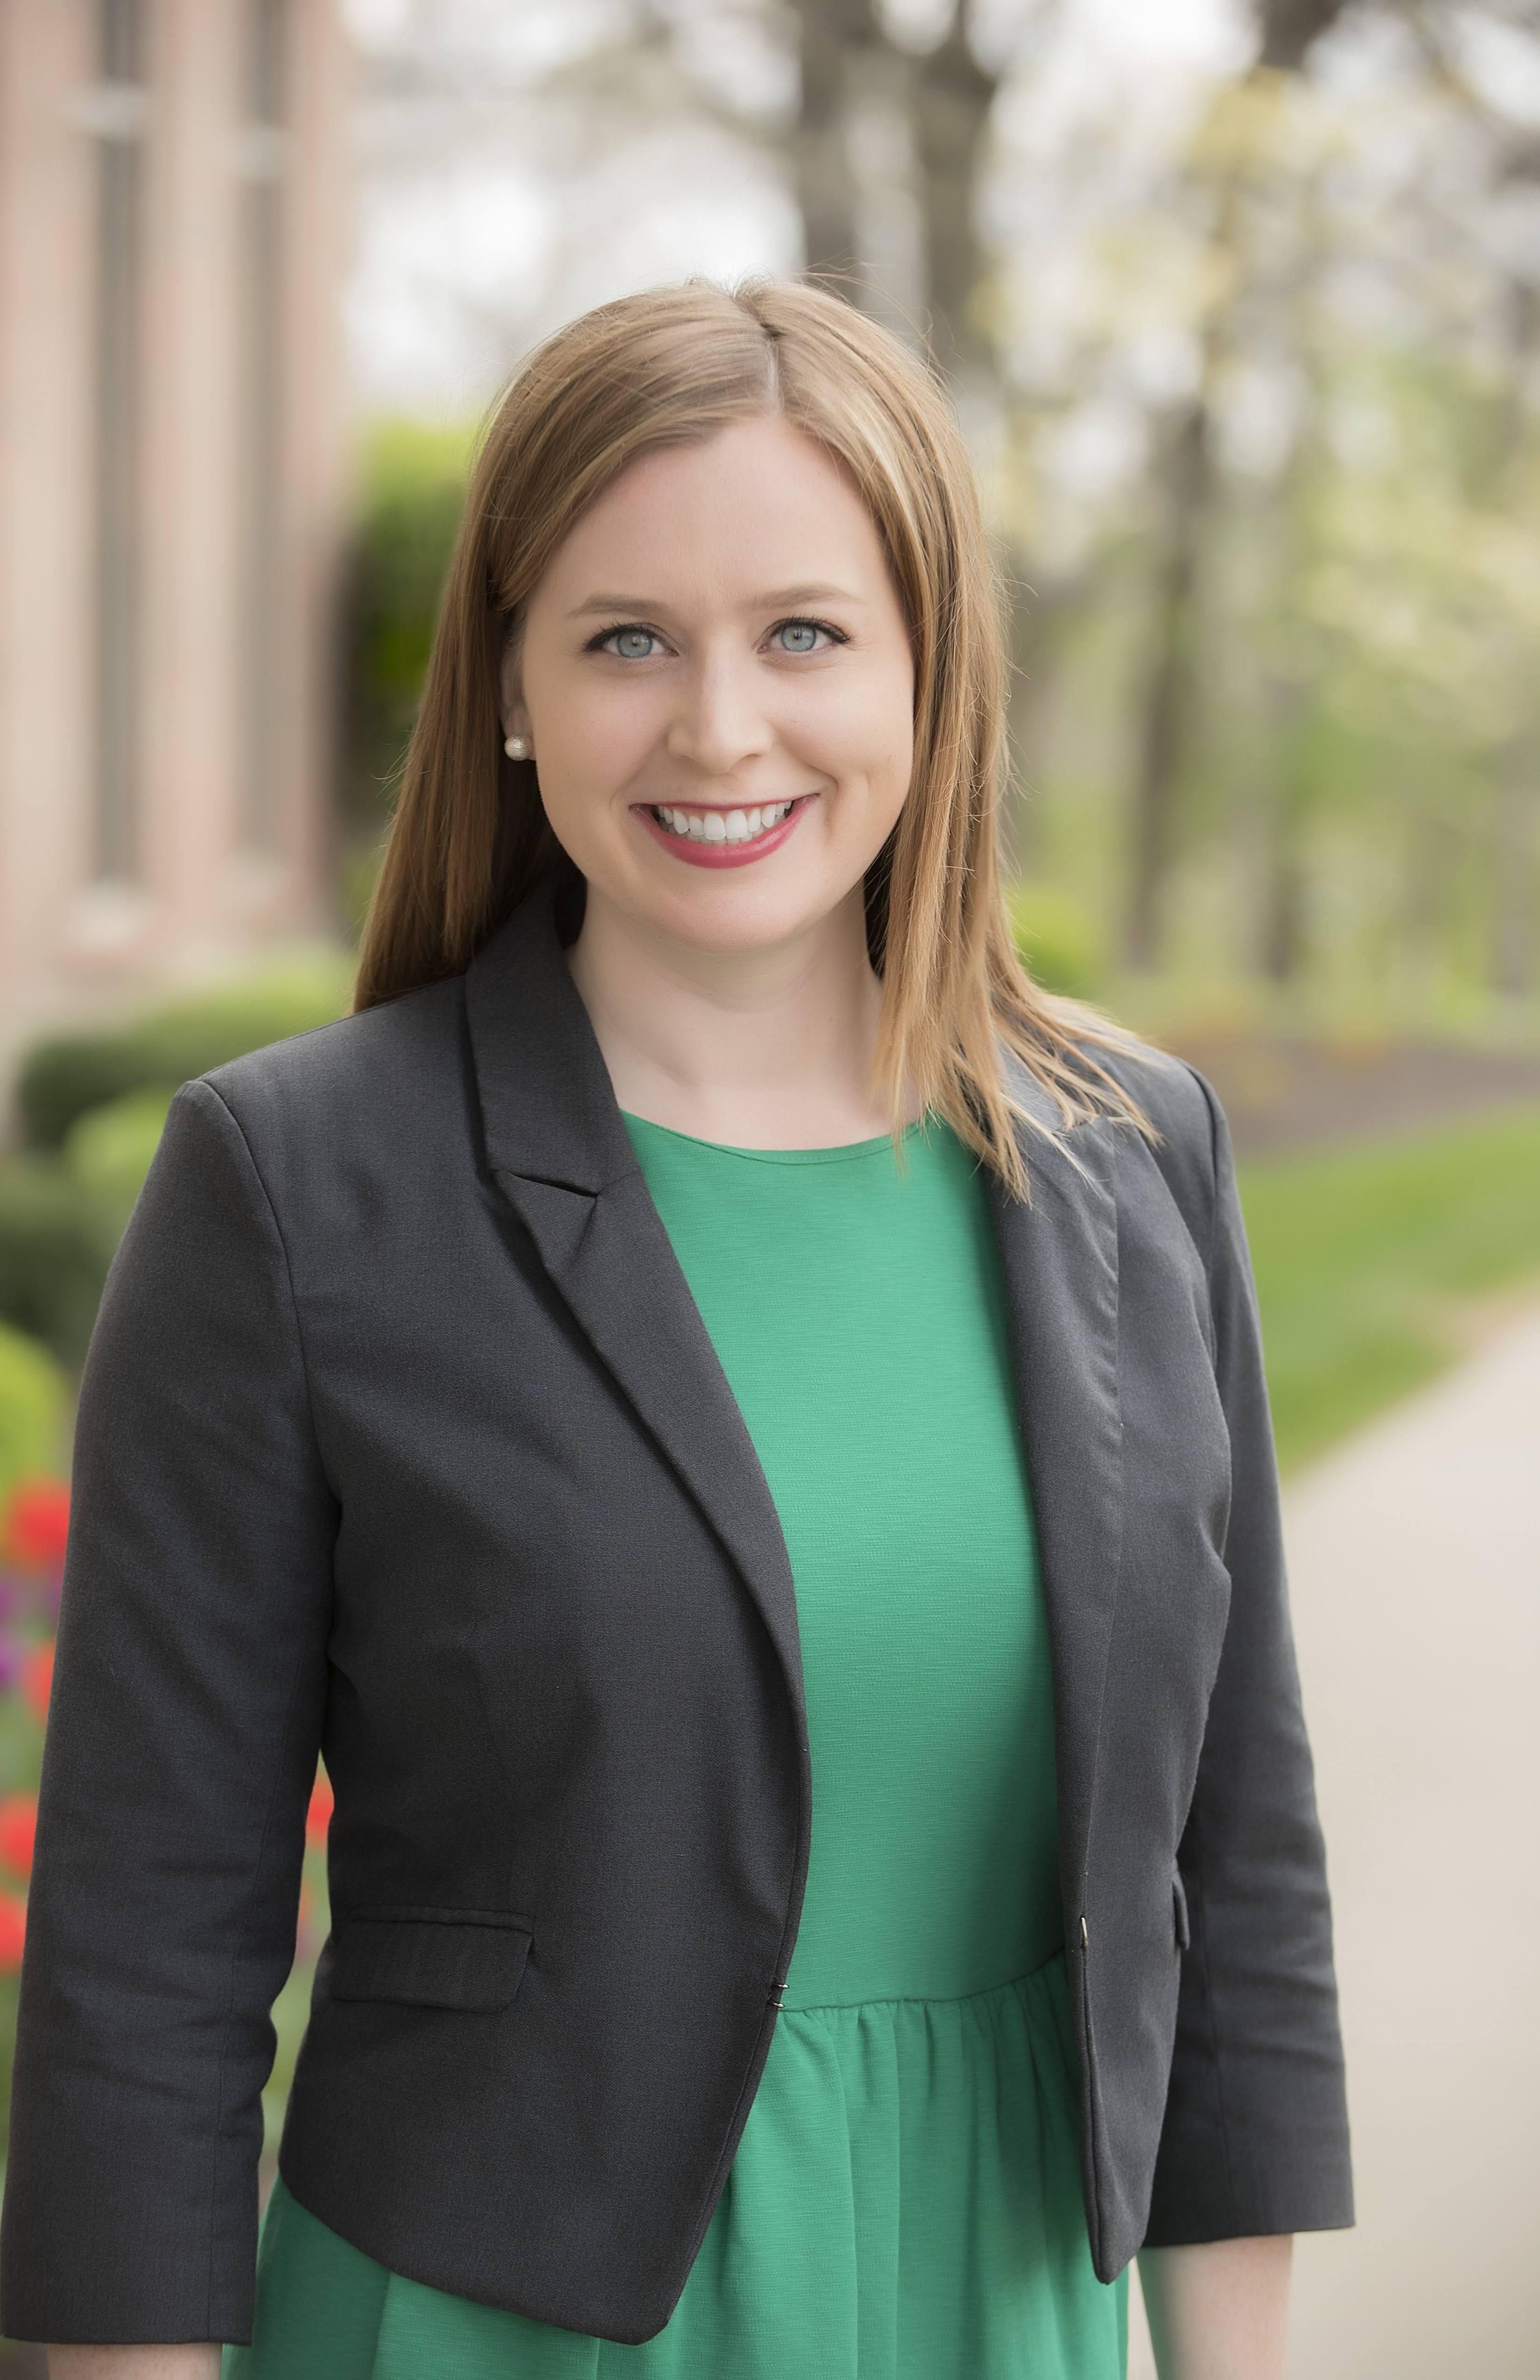 Kathryn Ayers Wickenhauser